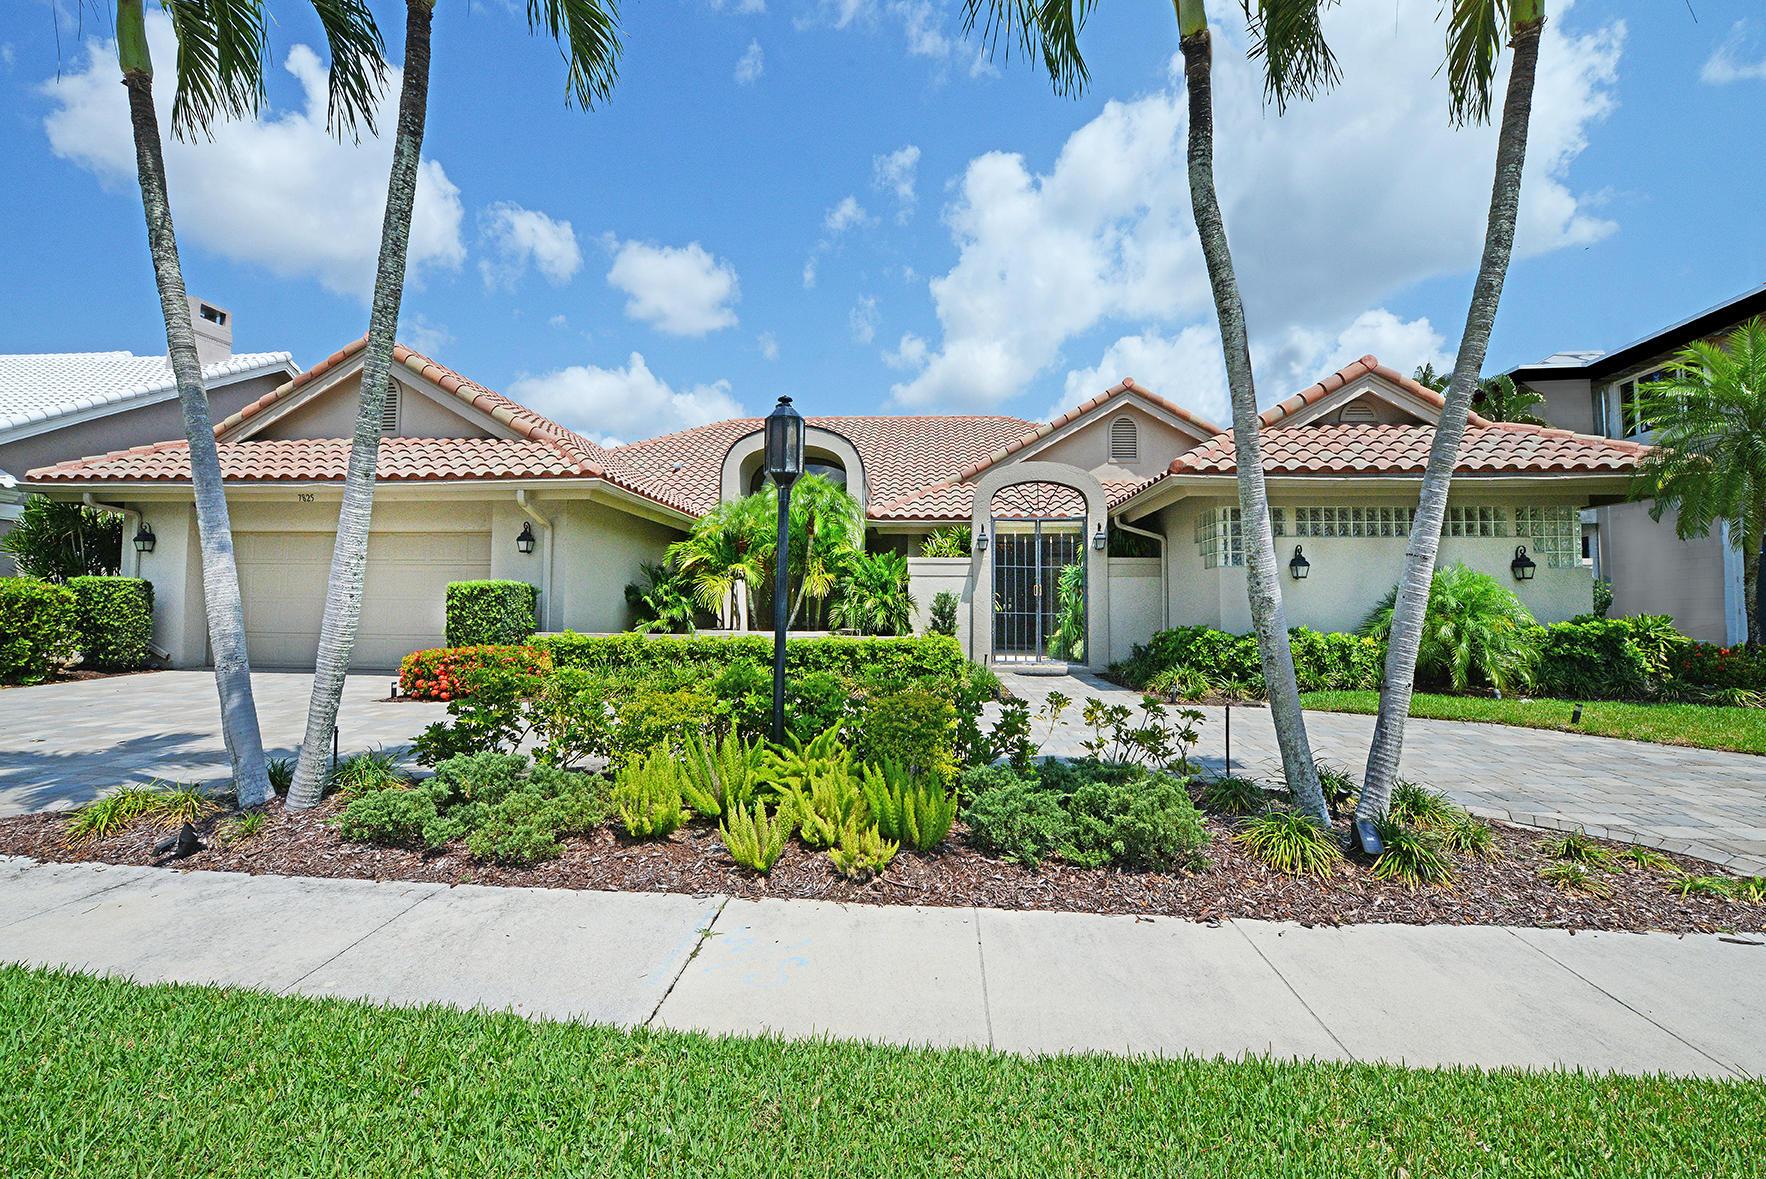 7825 Afton Villa Court, Boca Raton, Florida 33433, 3 Bedrooms Bedrooms, ,3.1 BathroomsBathrooms,A,Single family,Afton Villa,RX-10616982